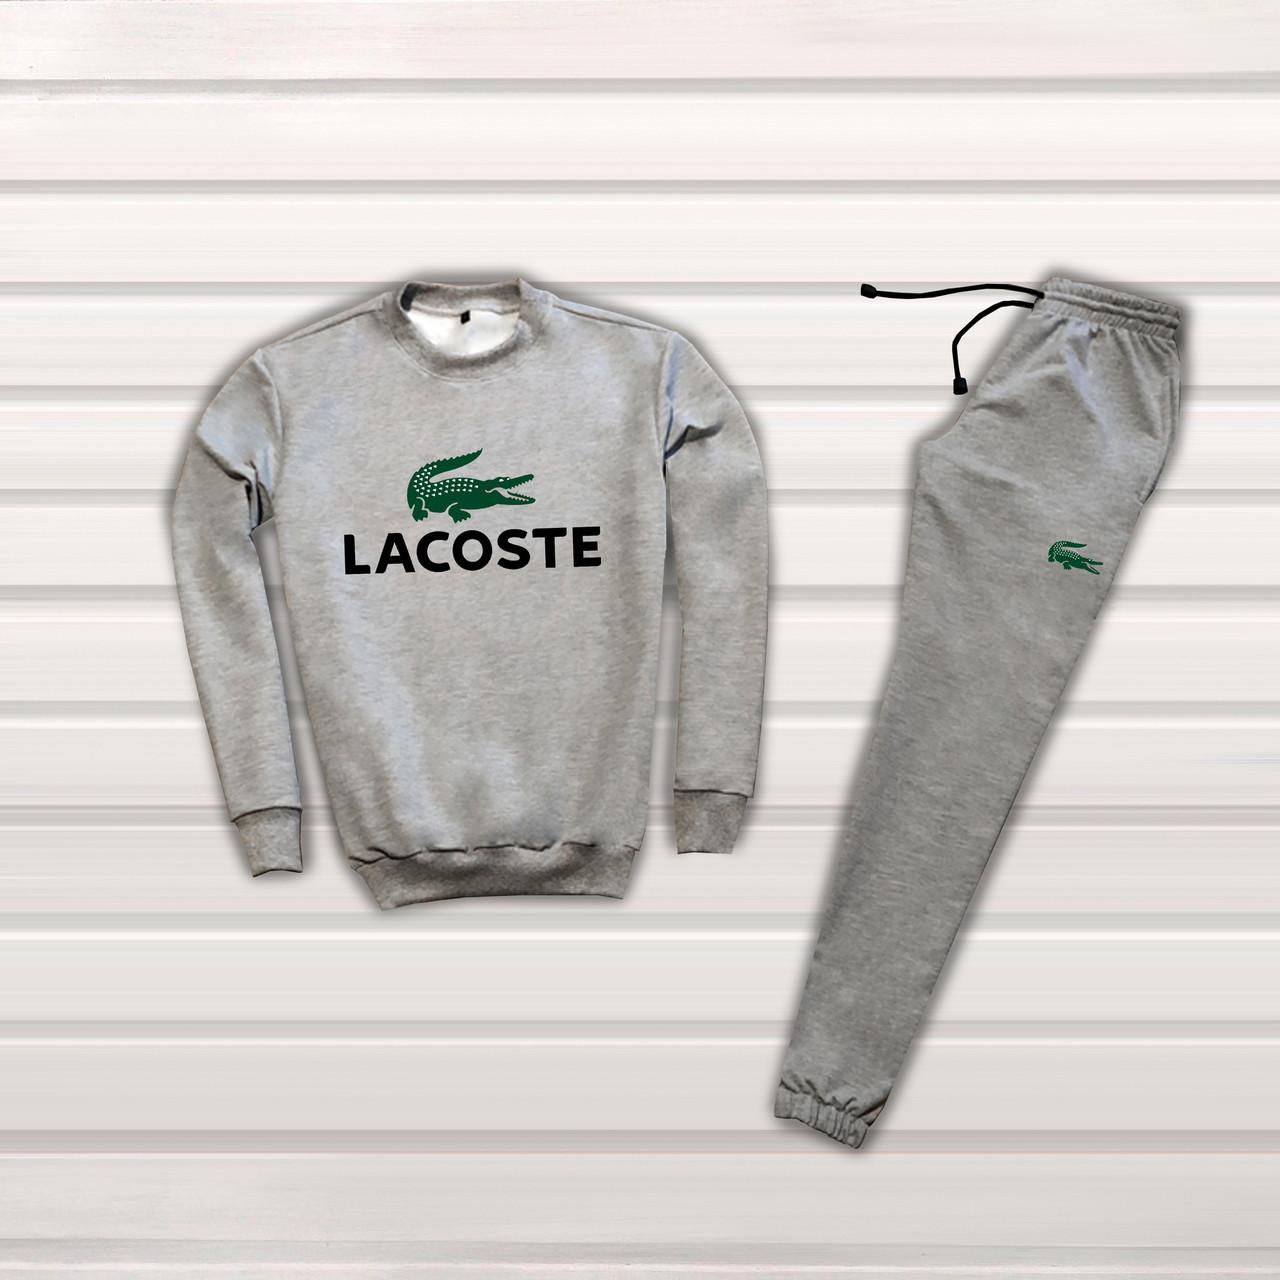 7beeae72 Мужской спортивный костюм, чоловічий спортивний костюм Lacoste S1140,  Реплика - Интернет-магазин